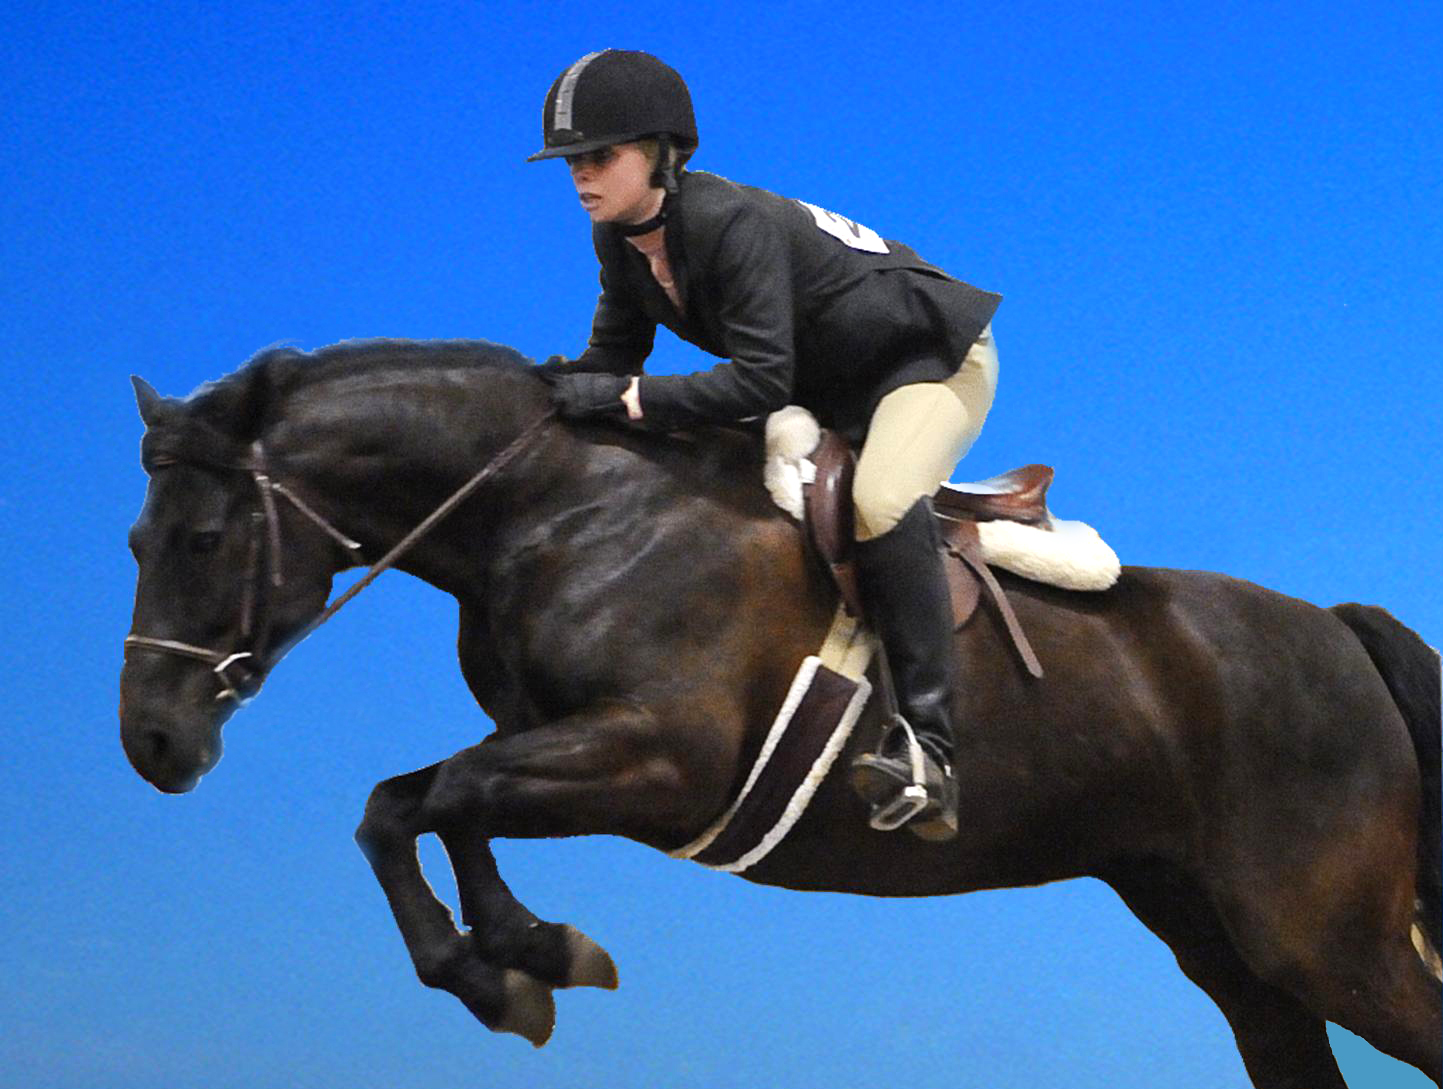 Download Black Horse JumpingBlack Horse Jumping